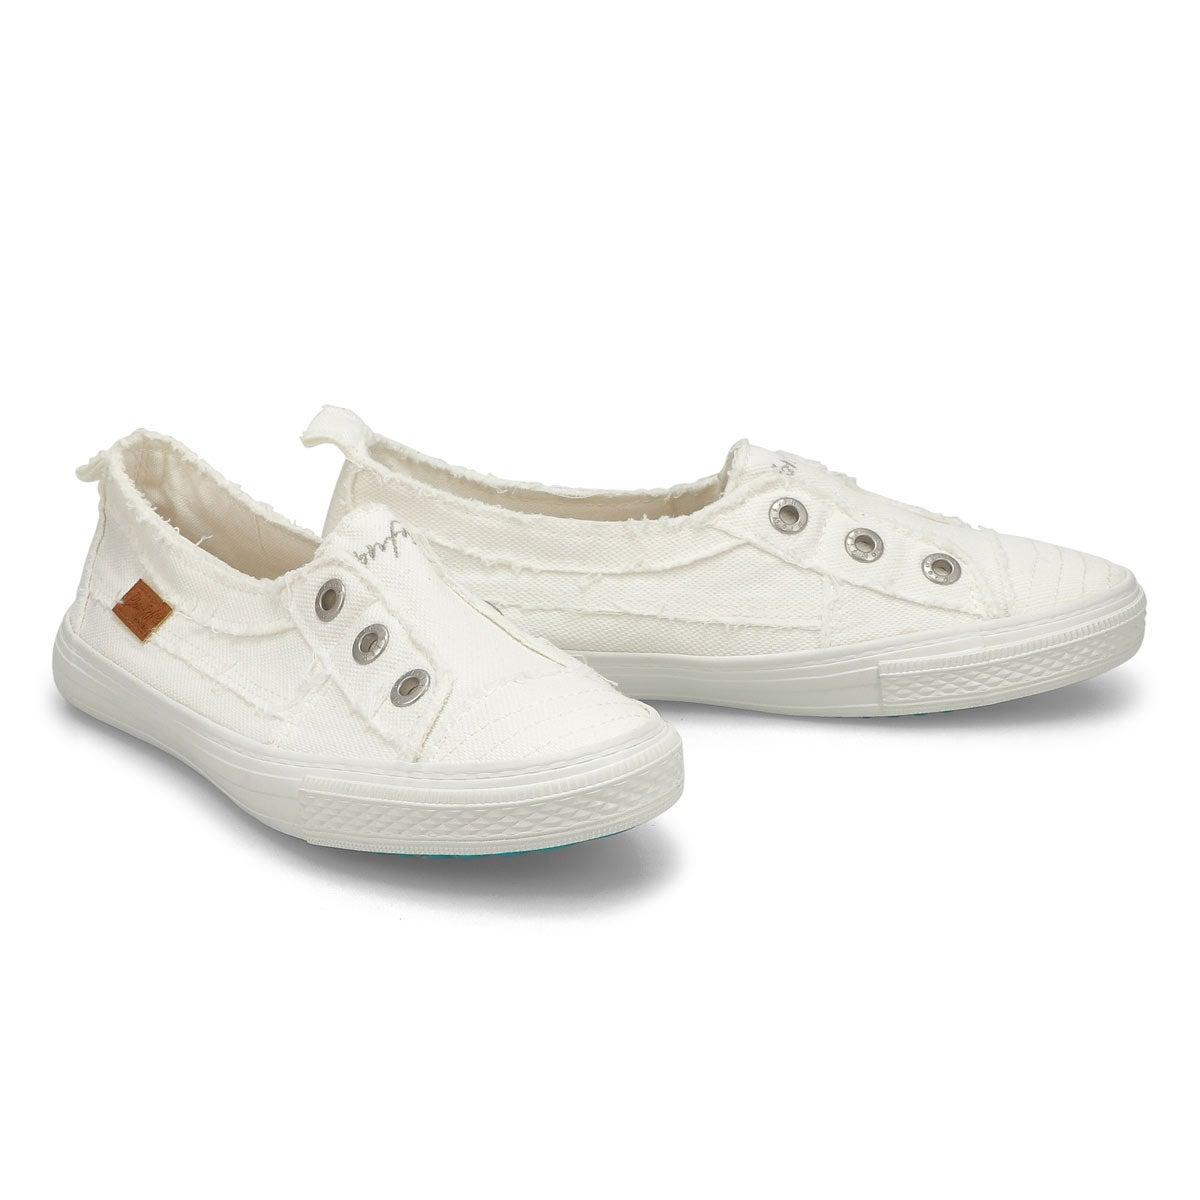 Lds Aussie wht slip on fashion sneakers